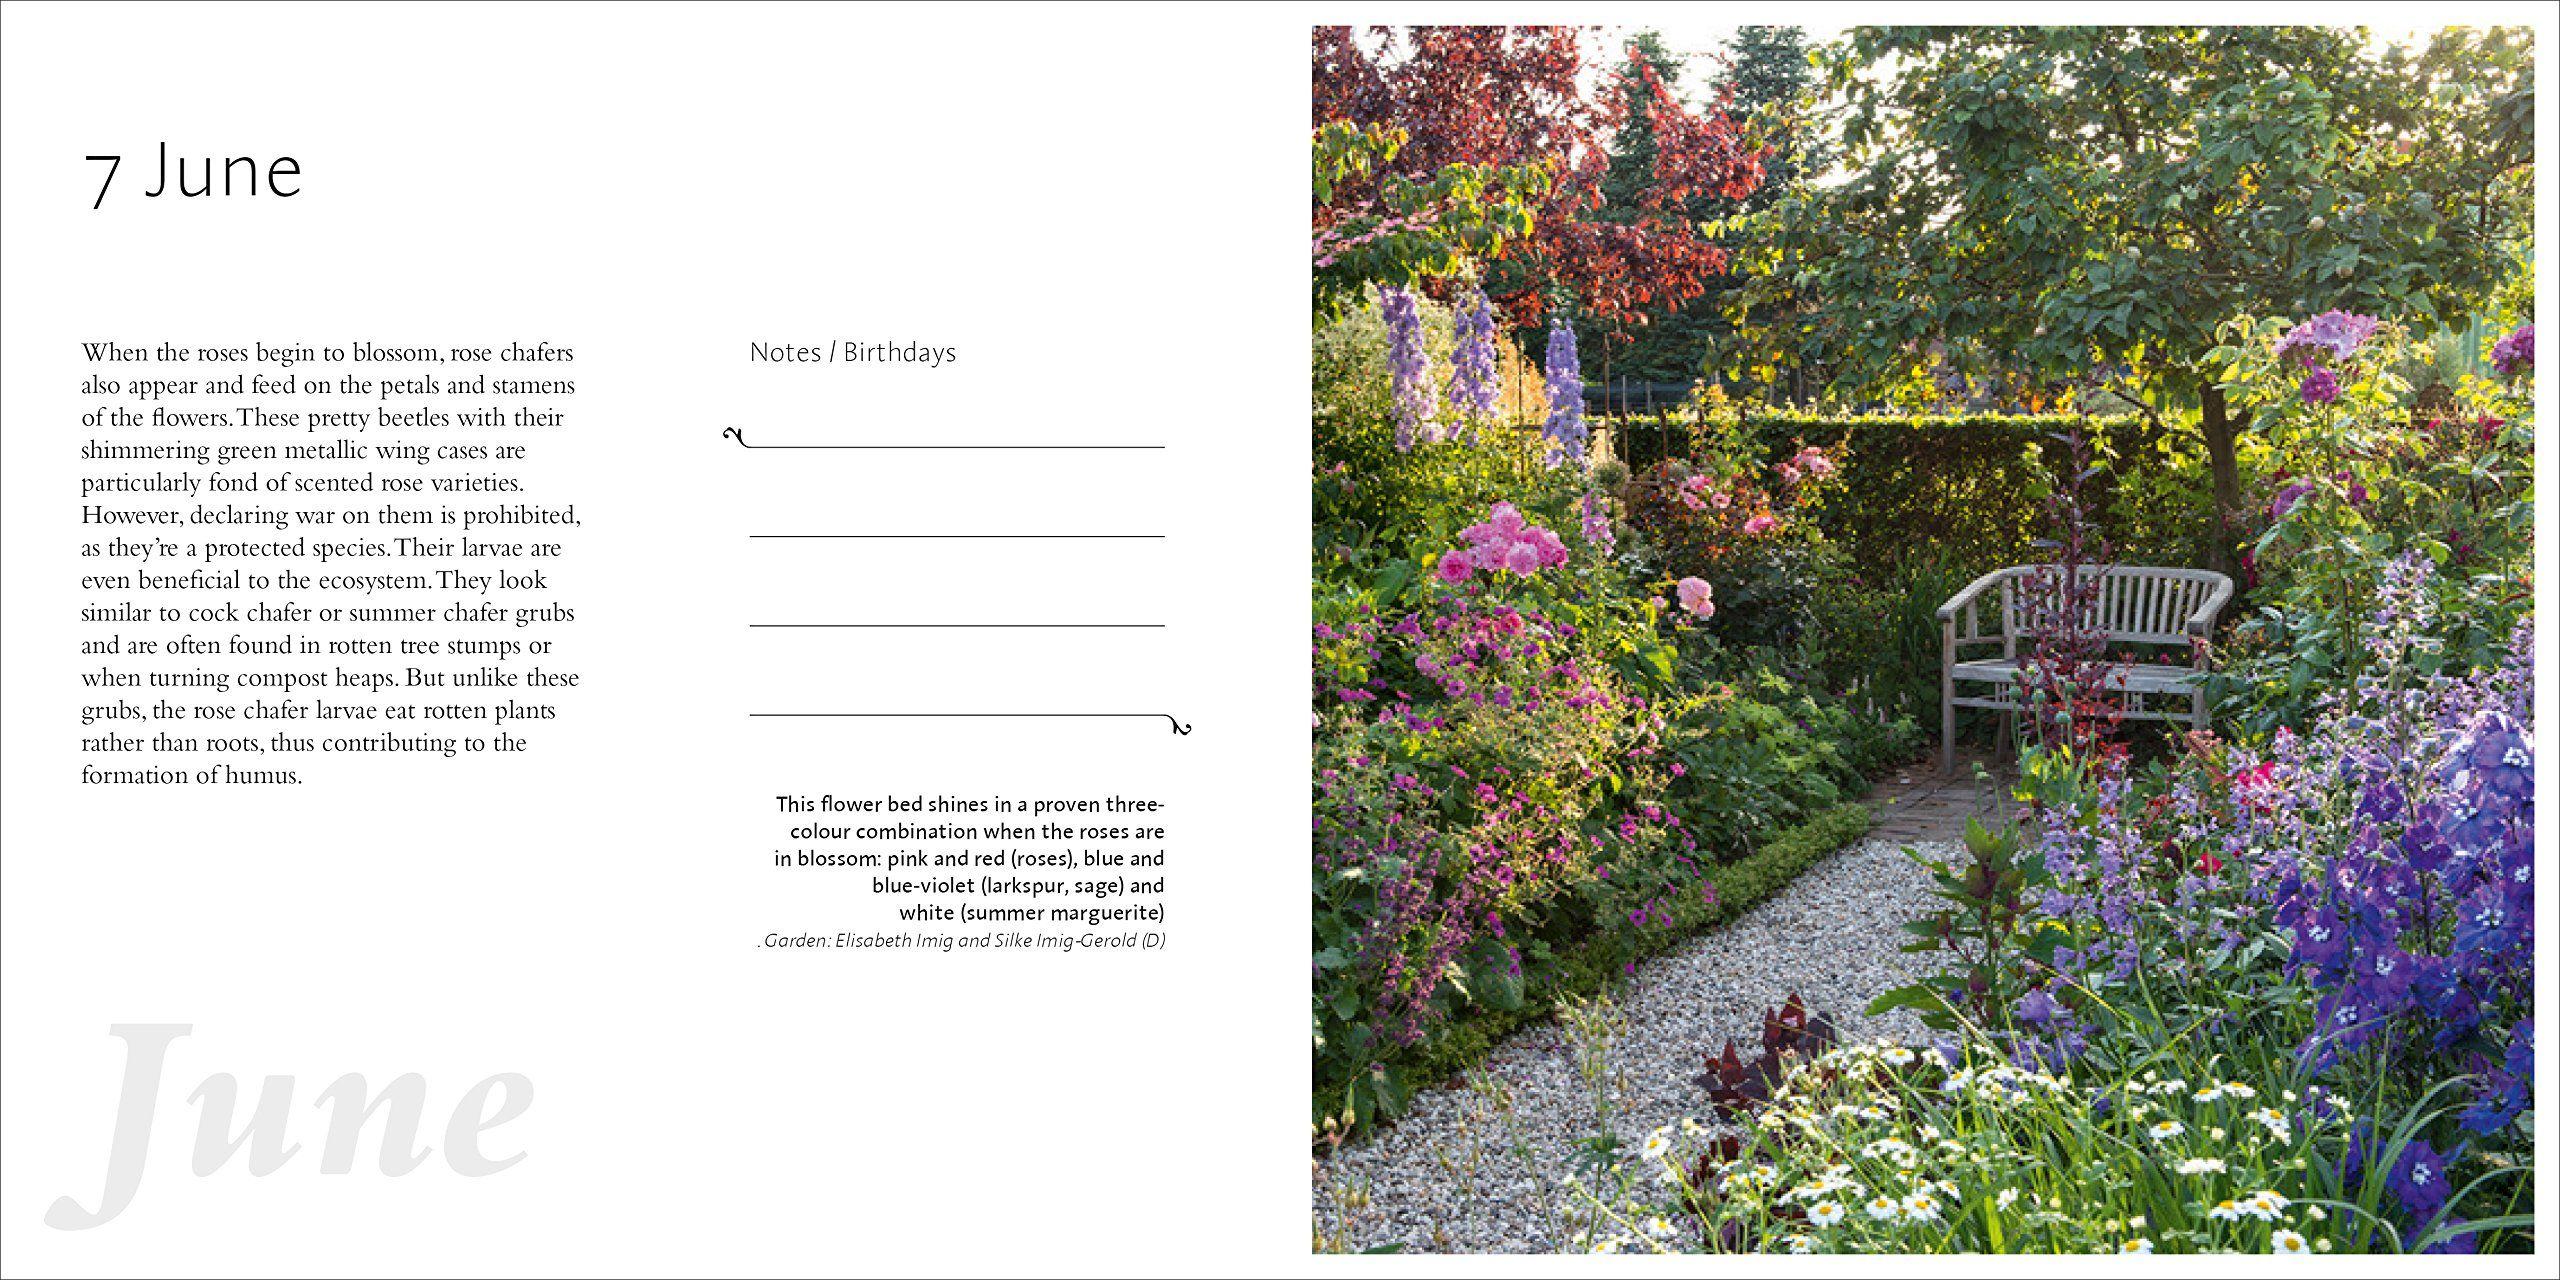 A Year In The Garden 365 Inspirational Gardens And Gardening Tips Gisela Keil Thomas Hagen Jurgen Becker Garden Gardening Tips Inspiration